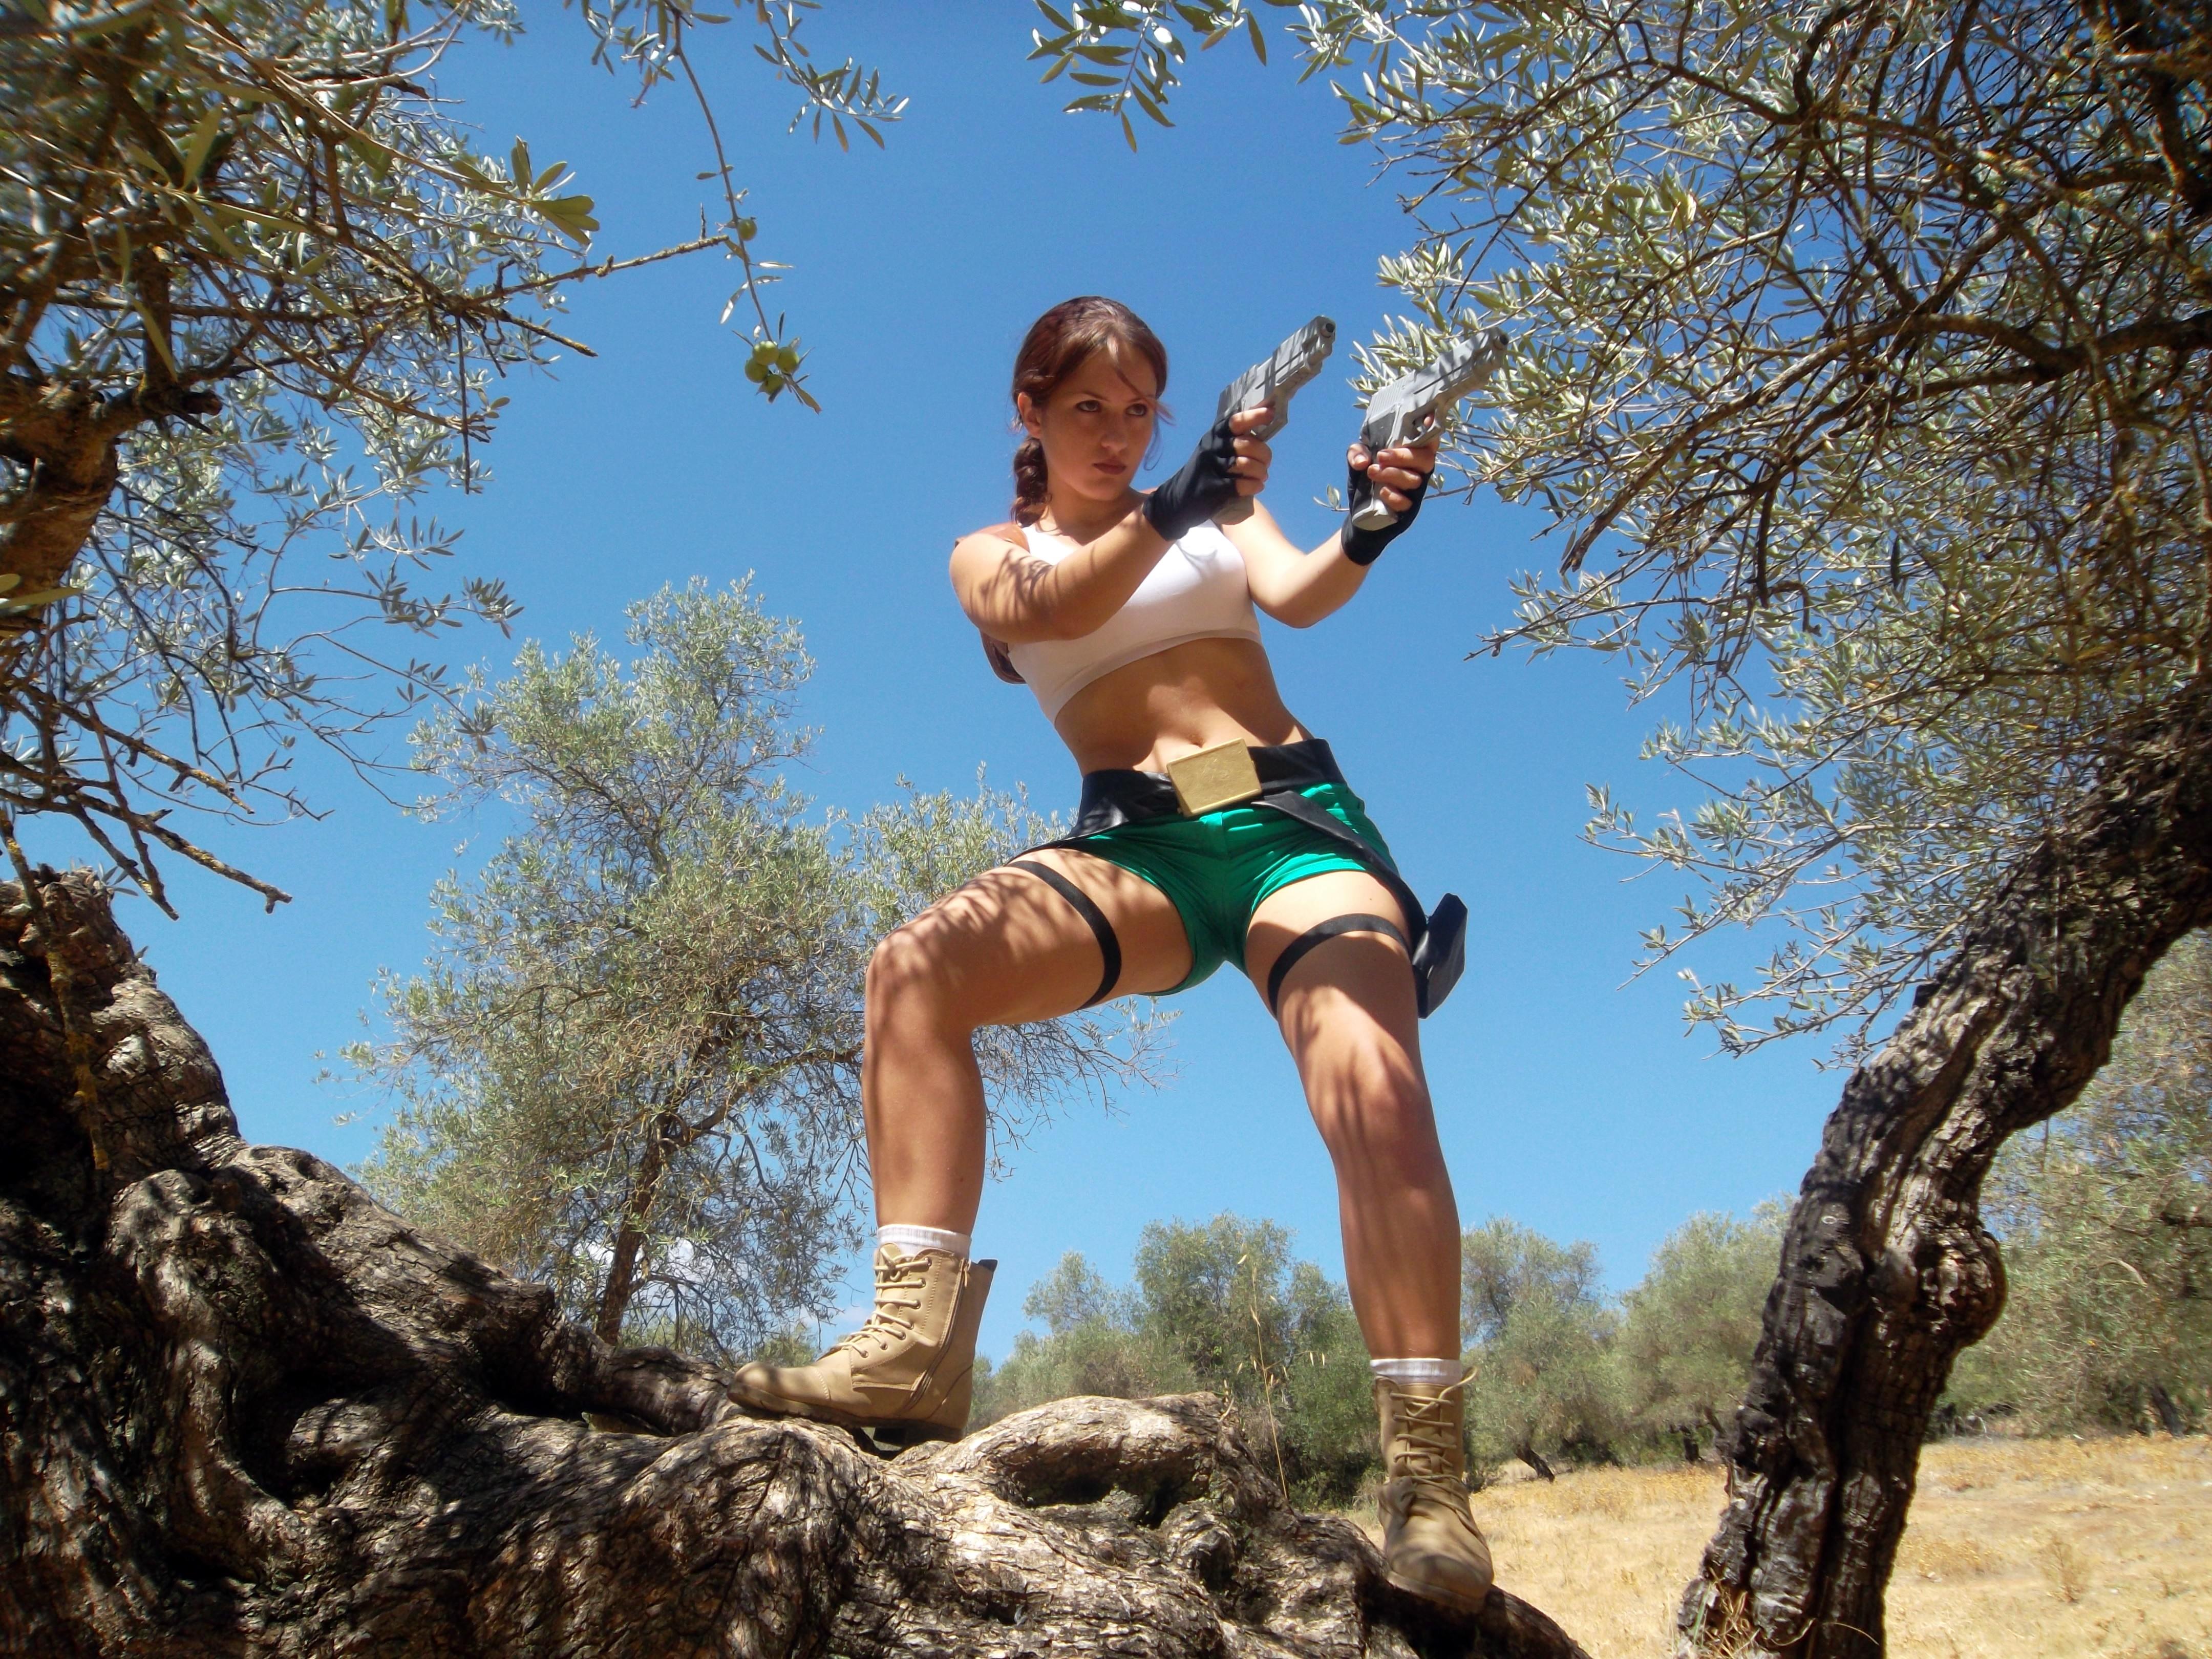 Tomb Raider III cosplay by Val-Raiseth